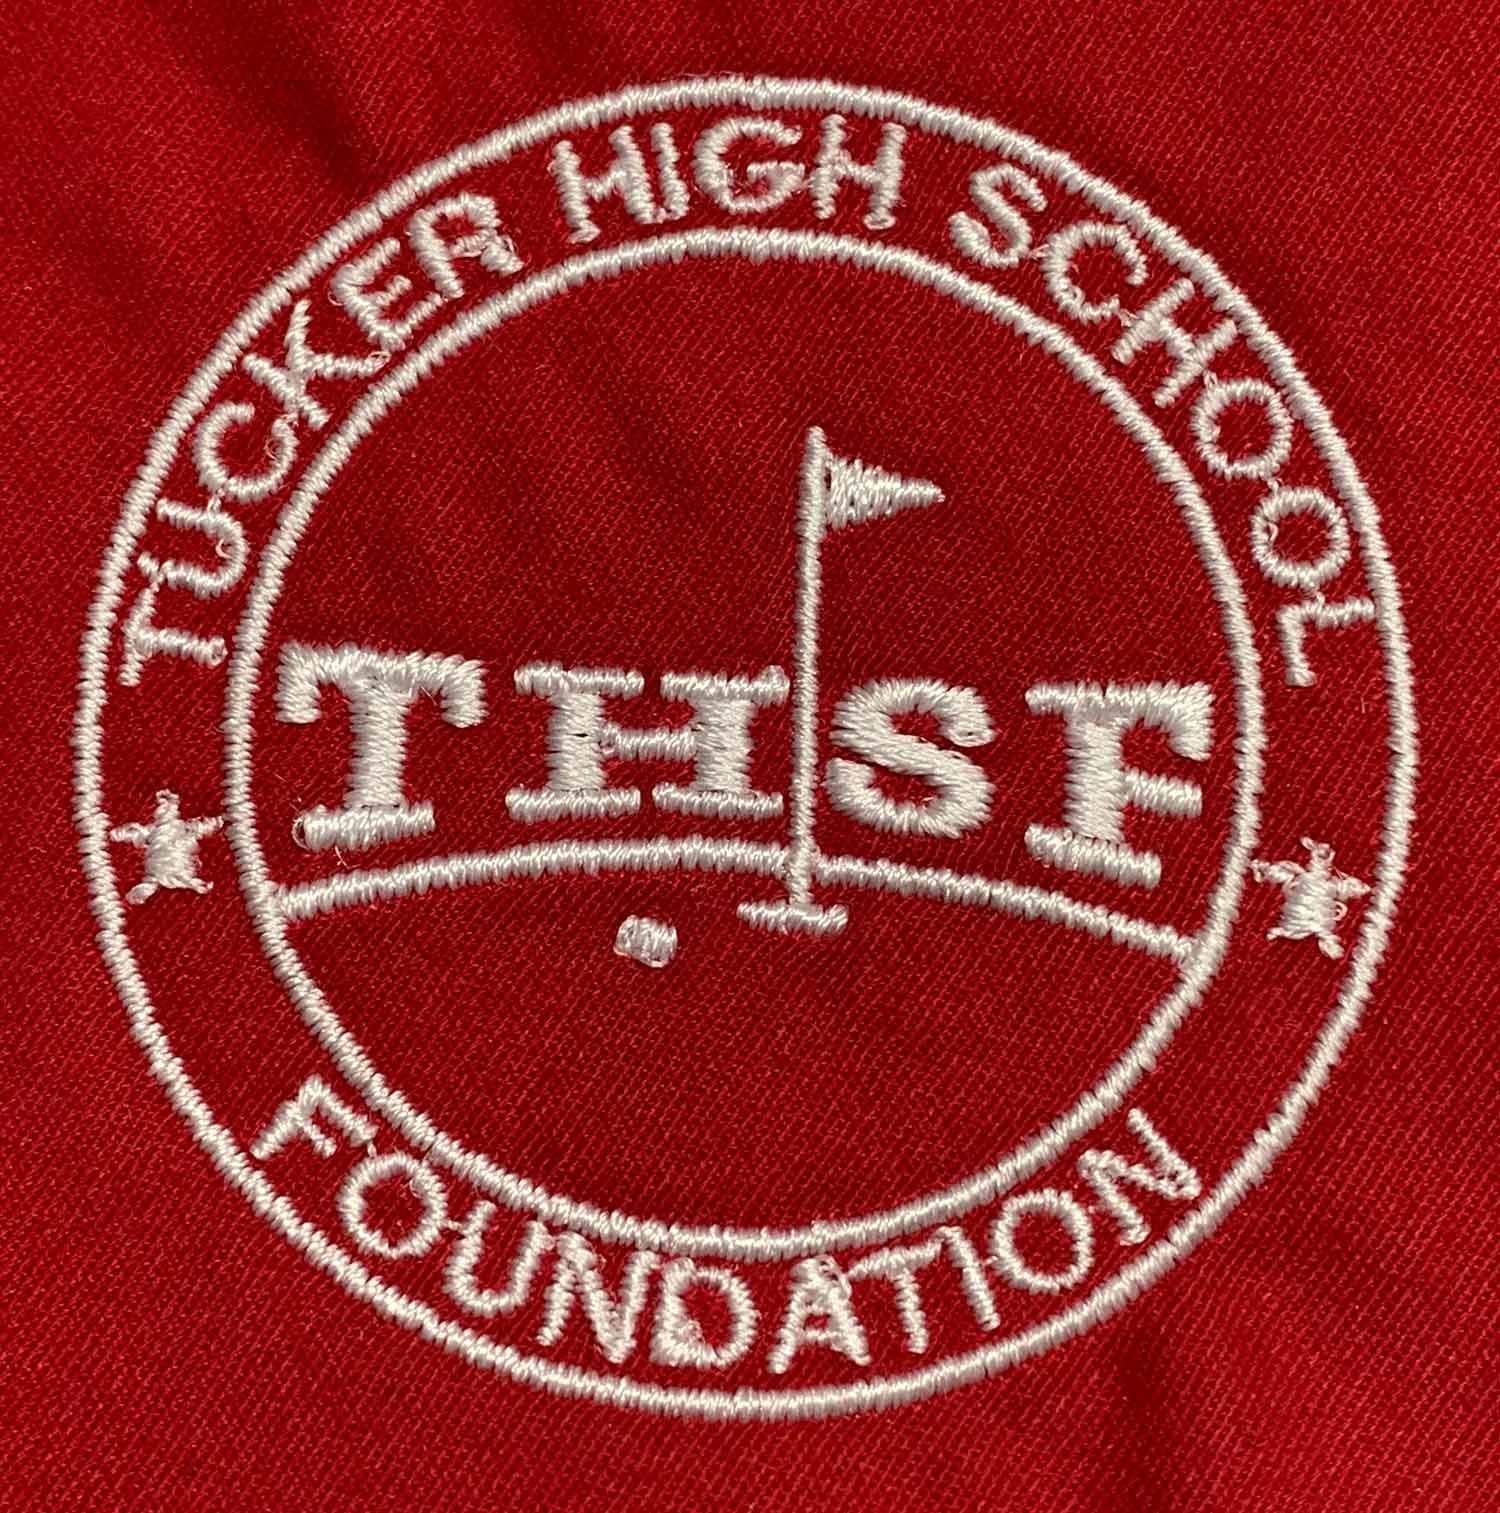 KYC_TUCKER-HIGH-SCHOOL-FOUNDATION_web.jpg